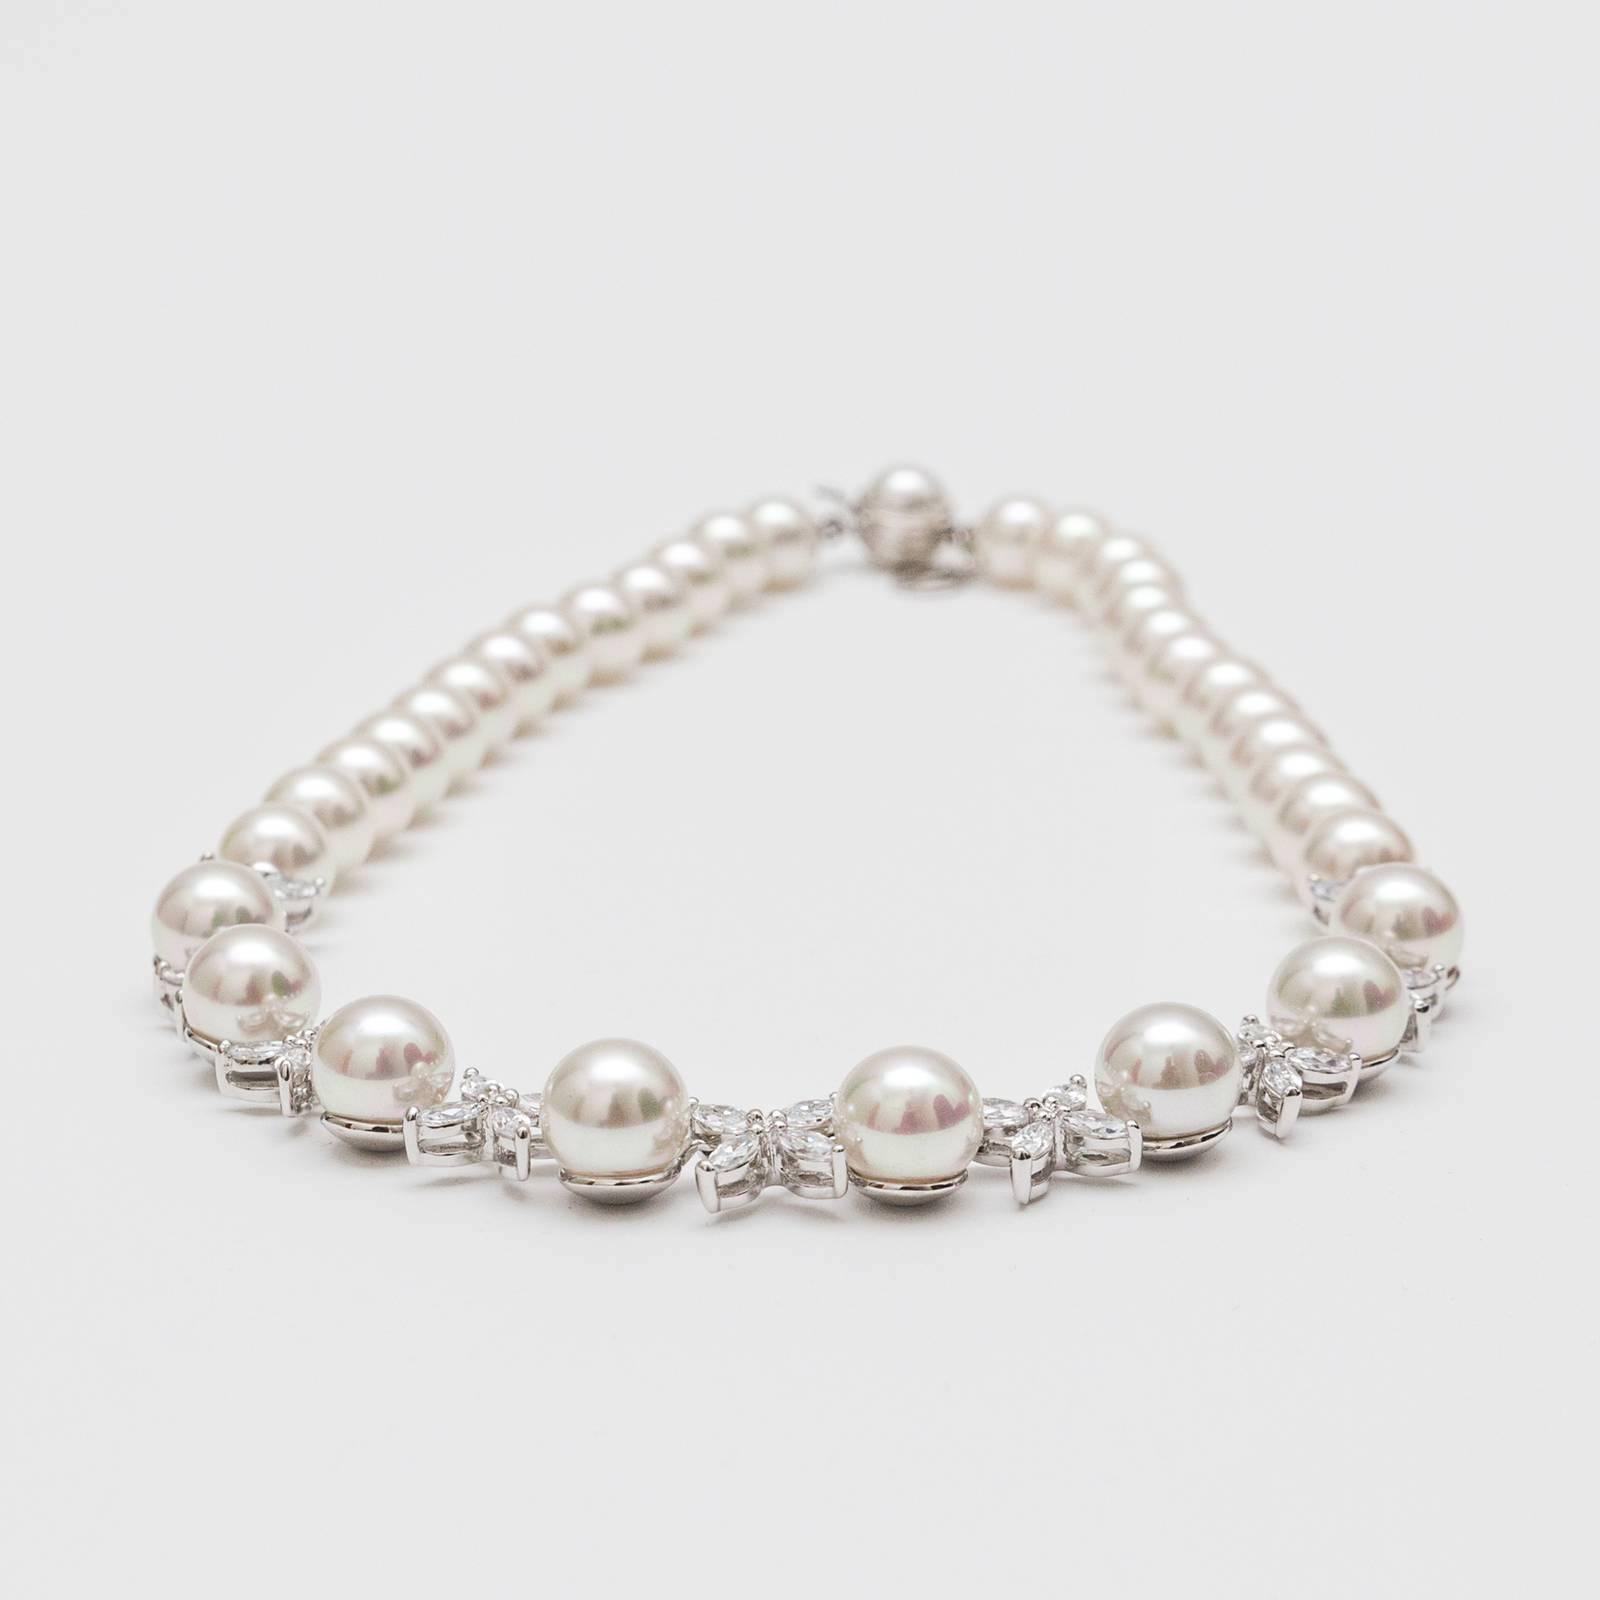 Colar Bridal - 12516.01.2